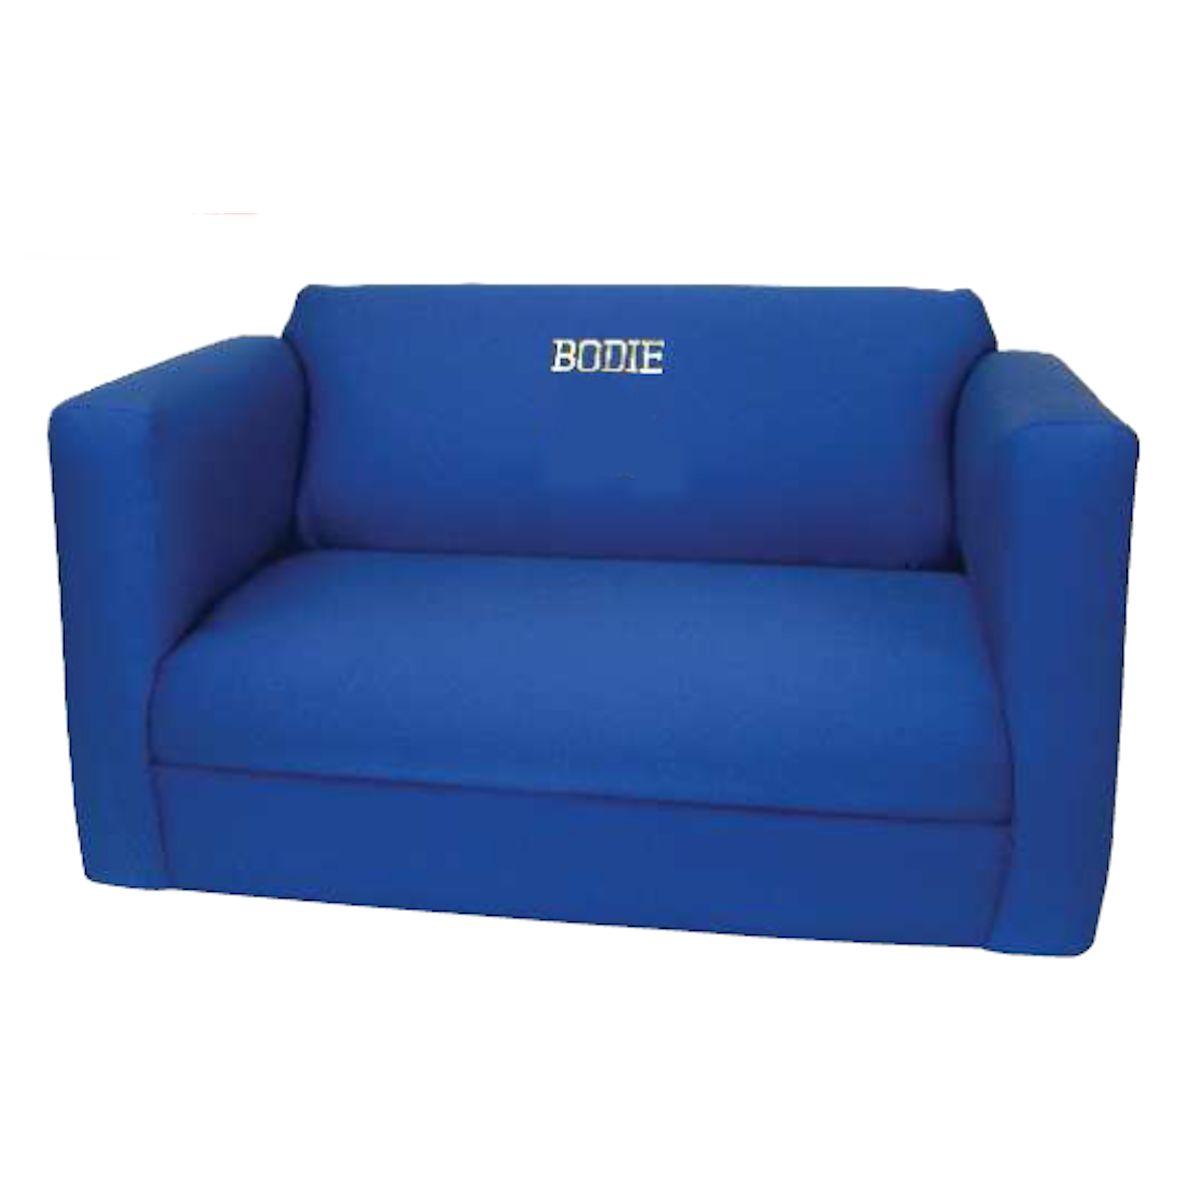 kids sofas personalized kidu0027s sofa (picture 1/3) QLYBCVD